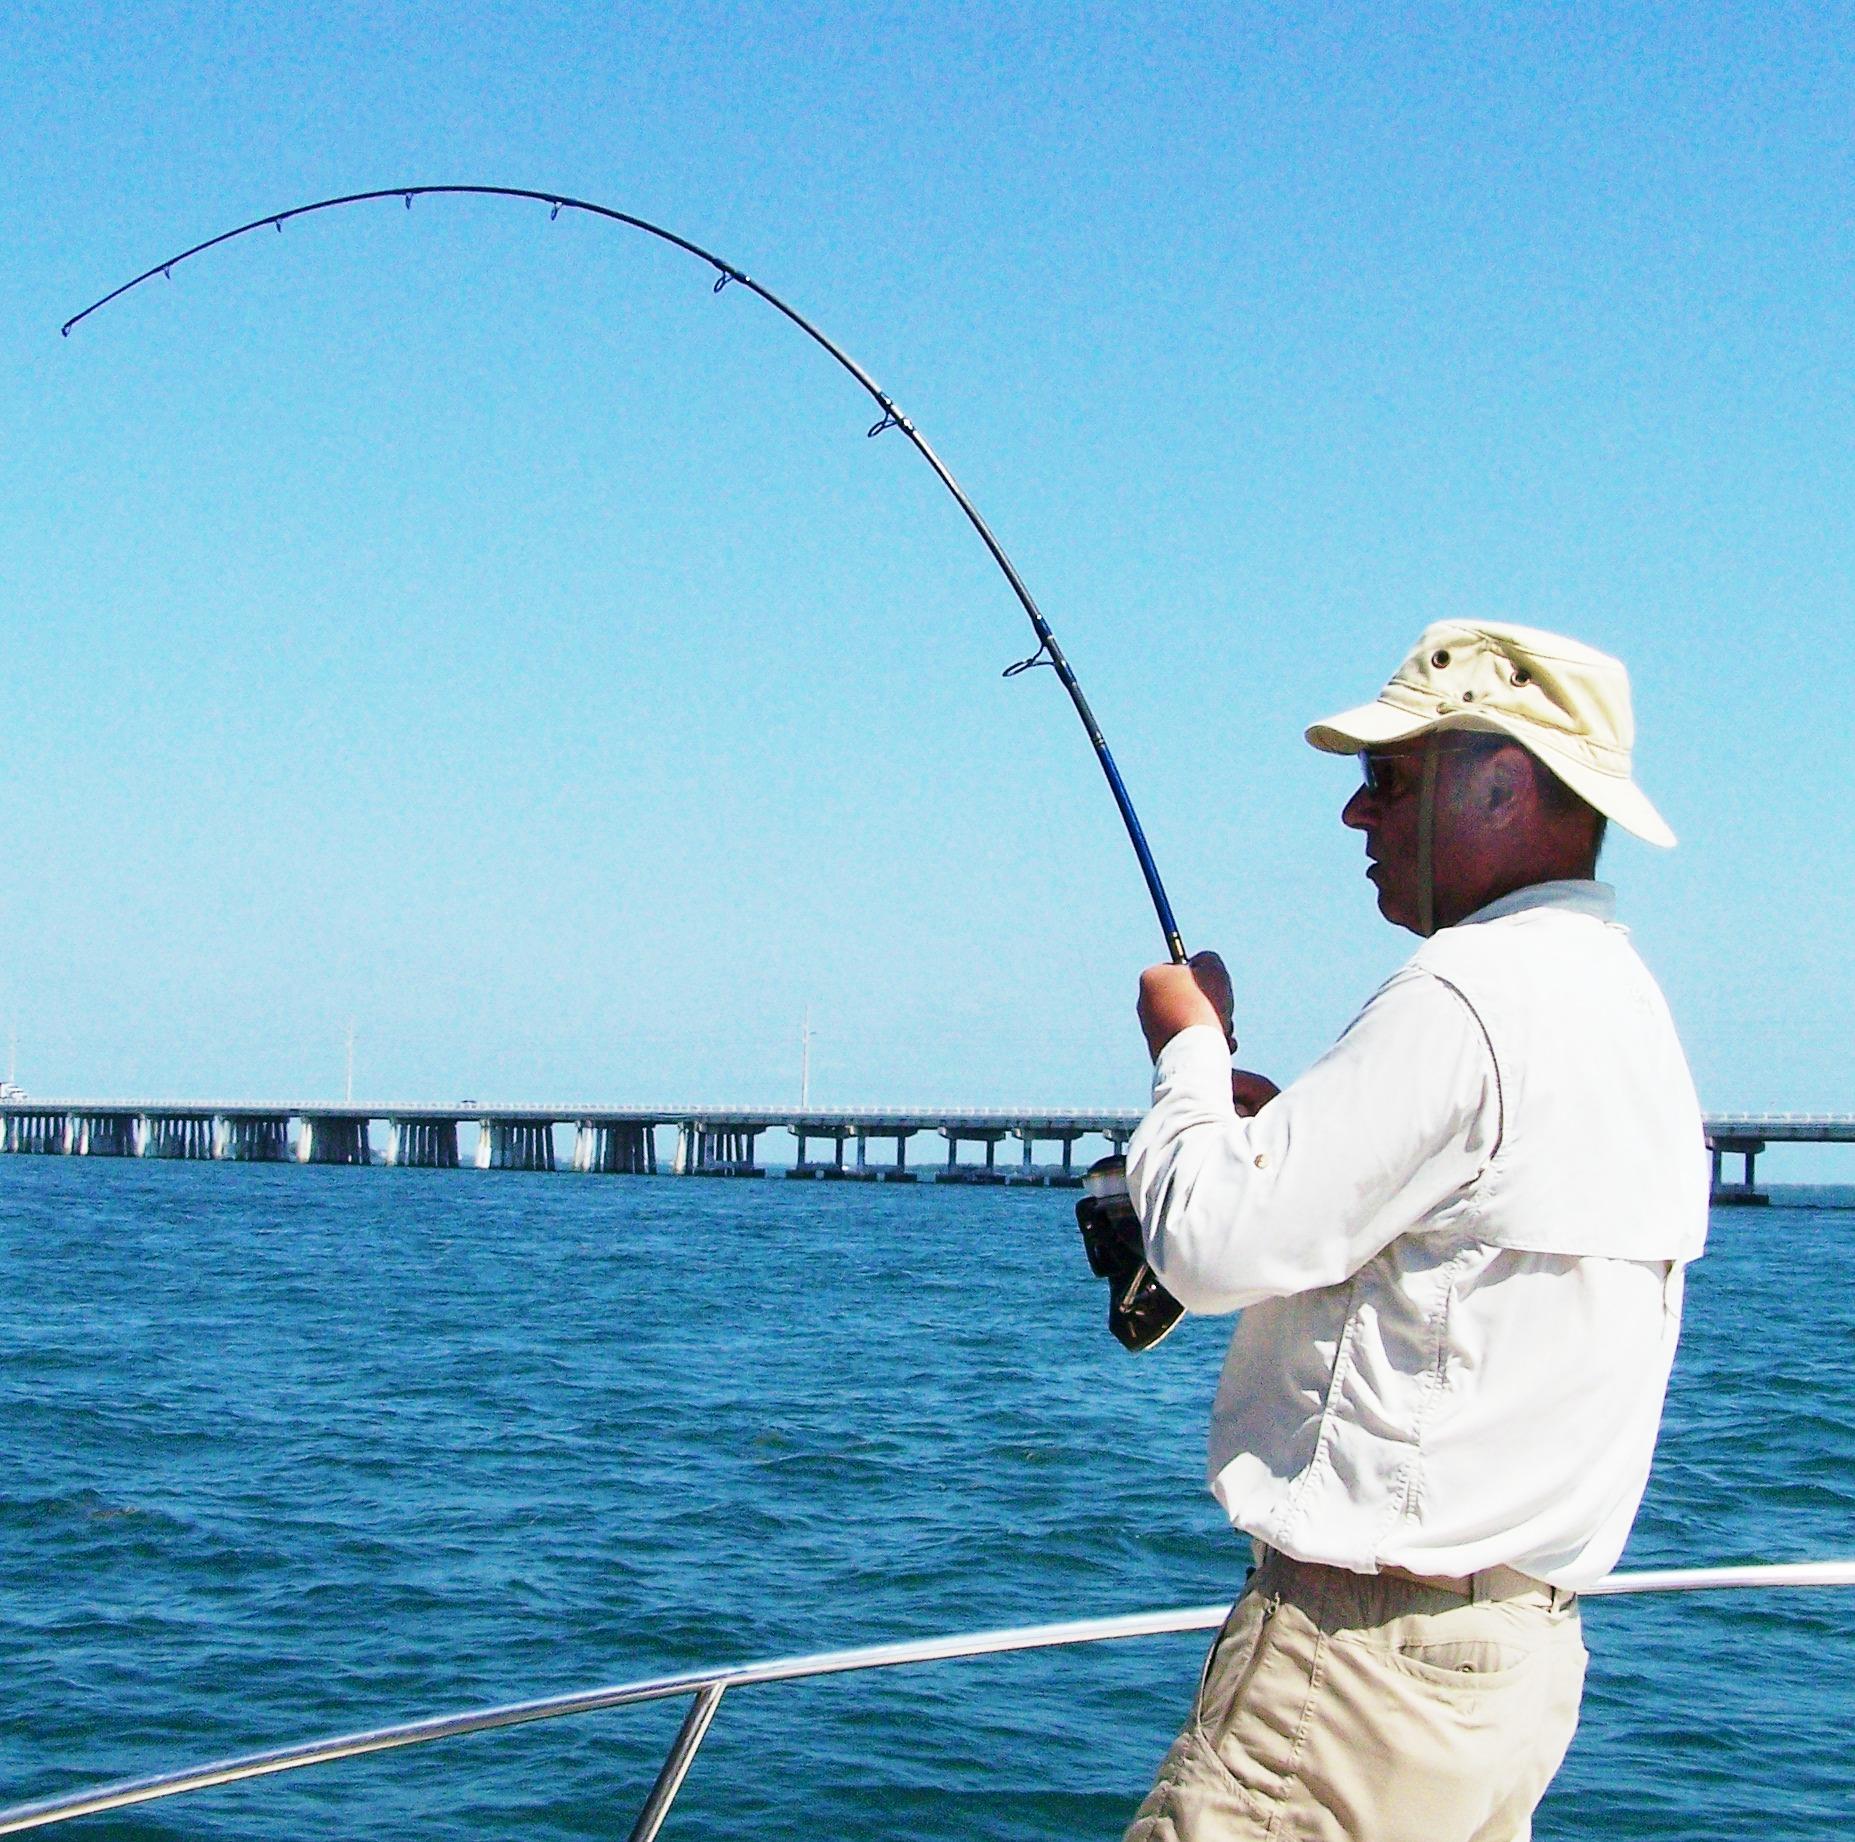 Marathon florida keys tarpon fishing with capt chris for Marathon key fishing